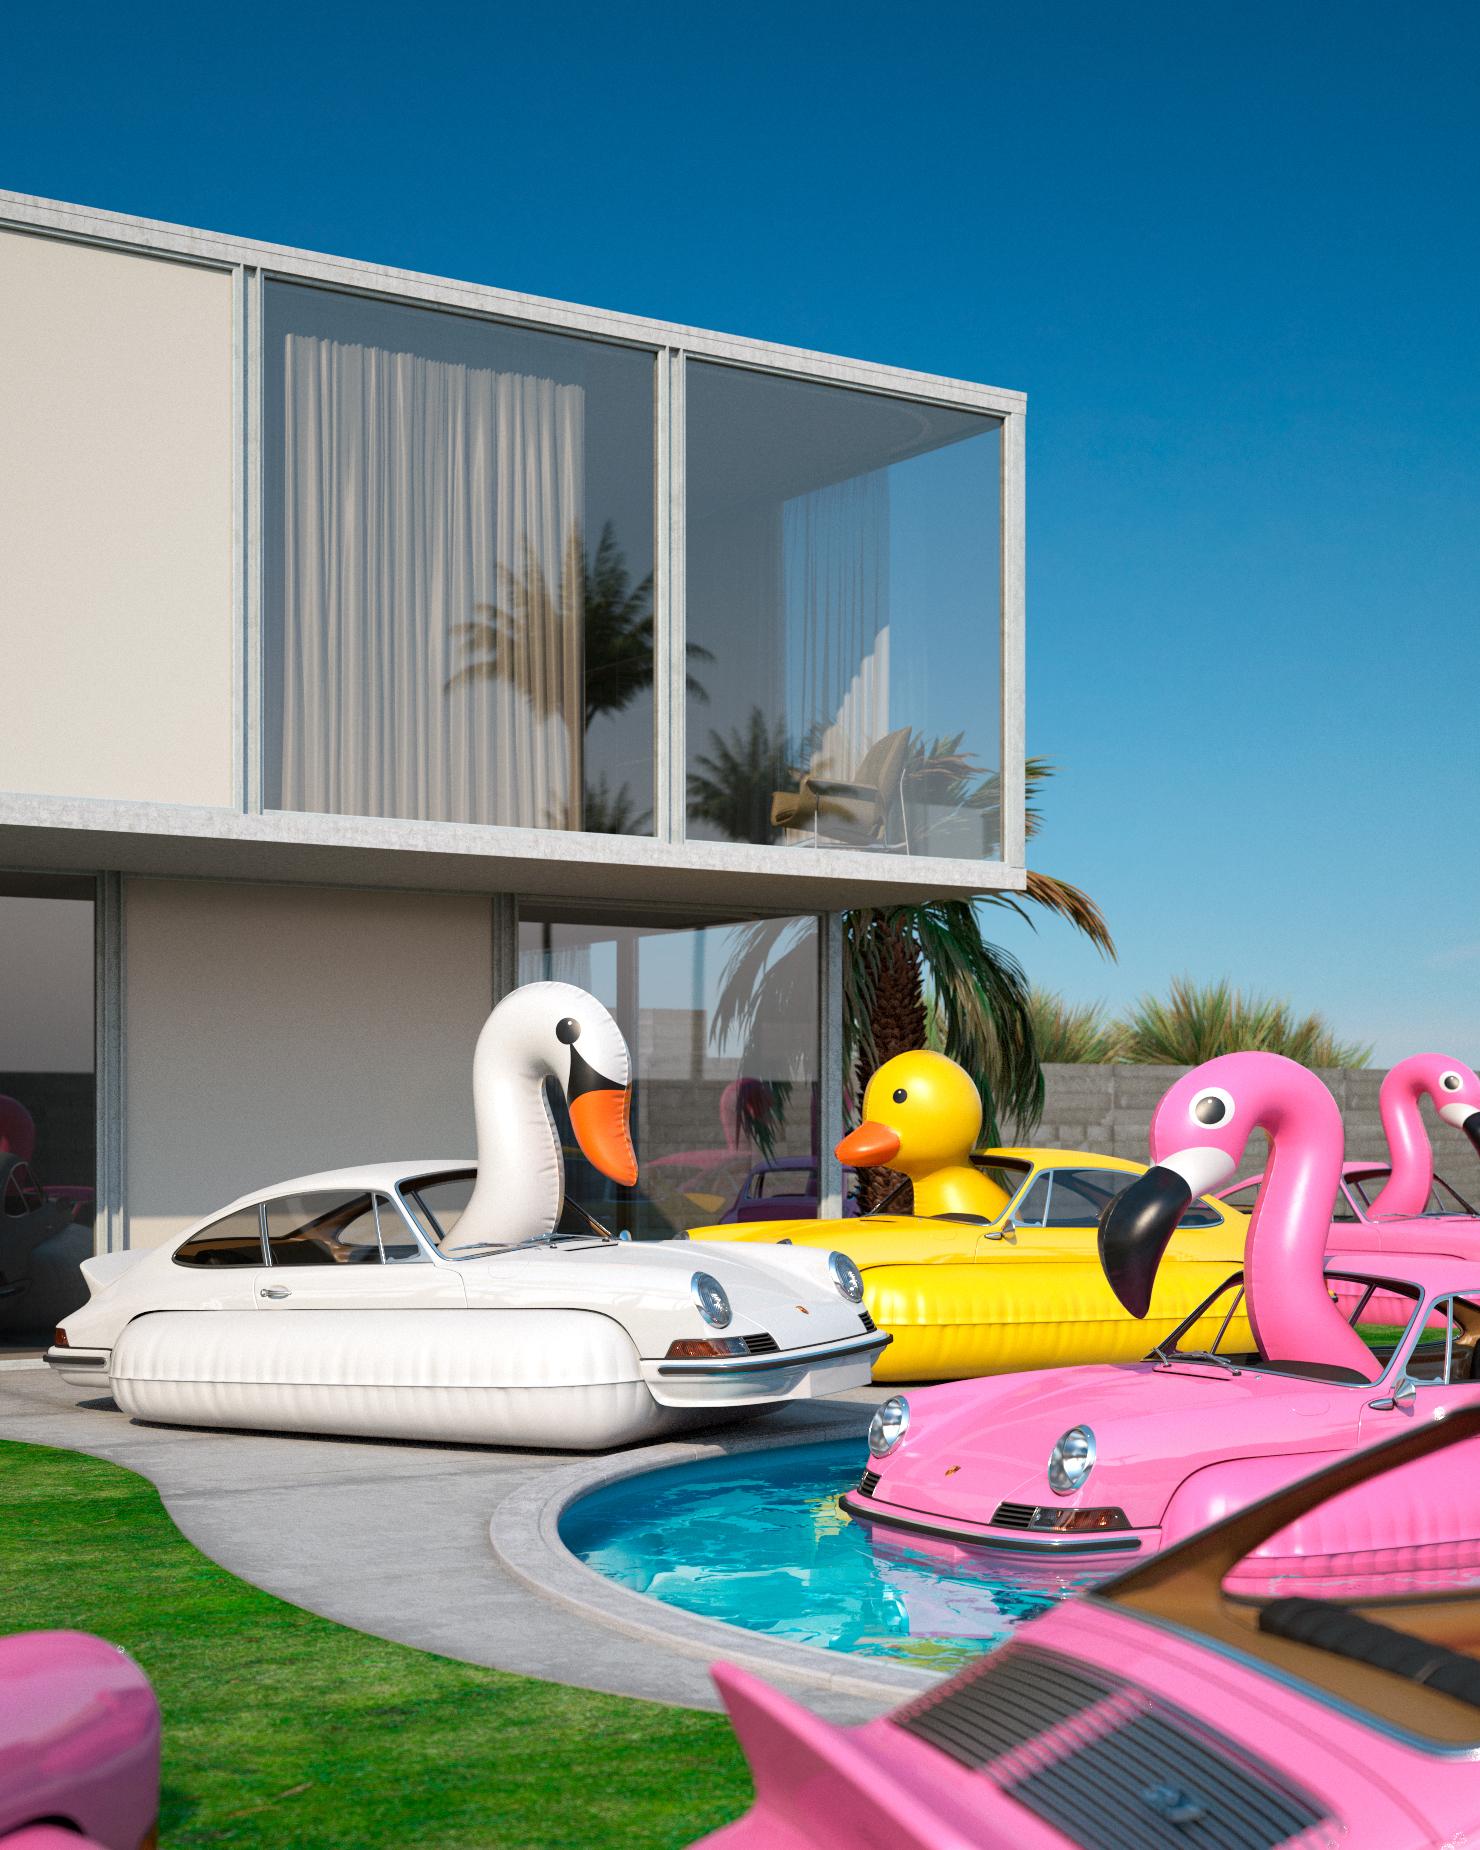 flock of porsche flamingos.jpg